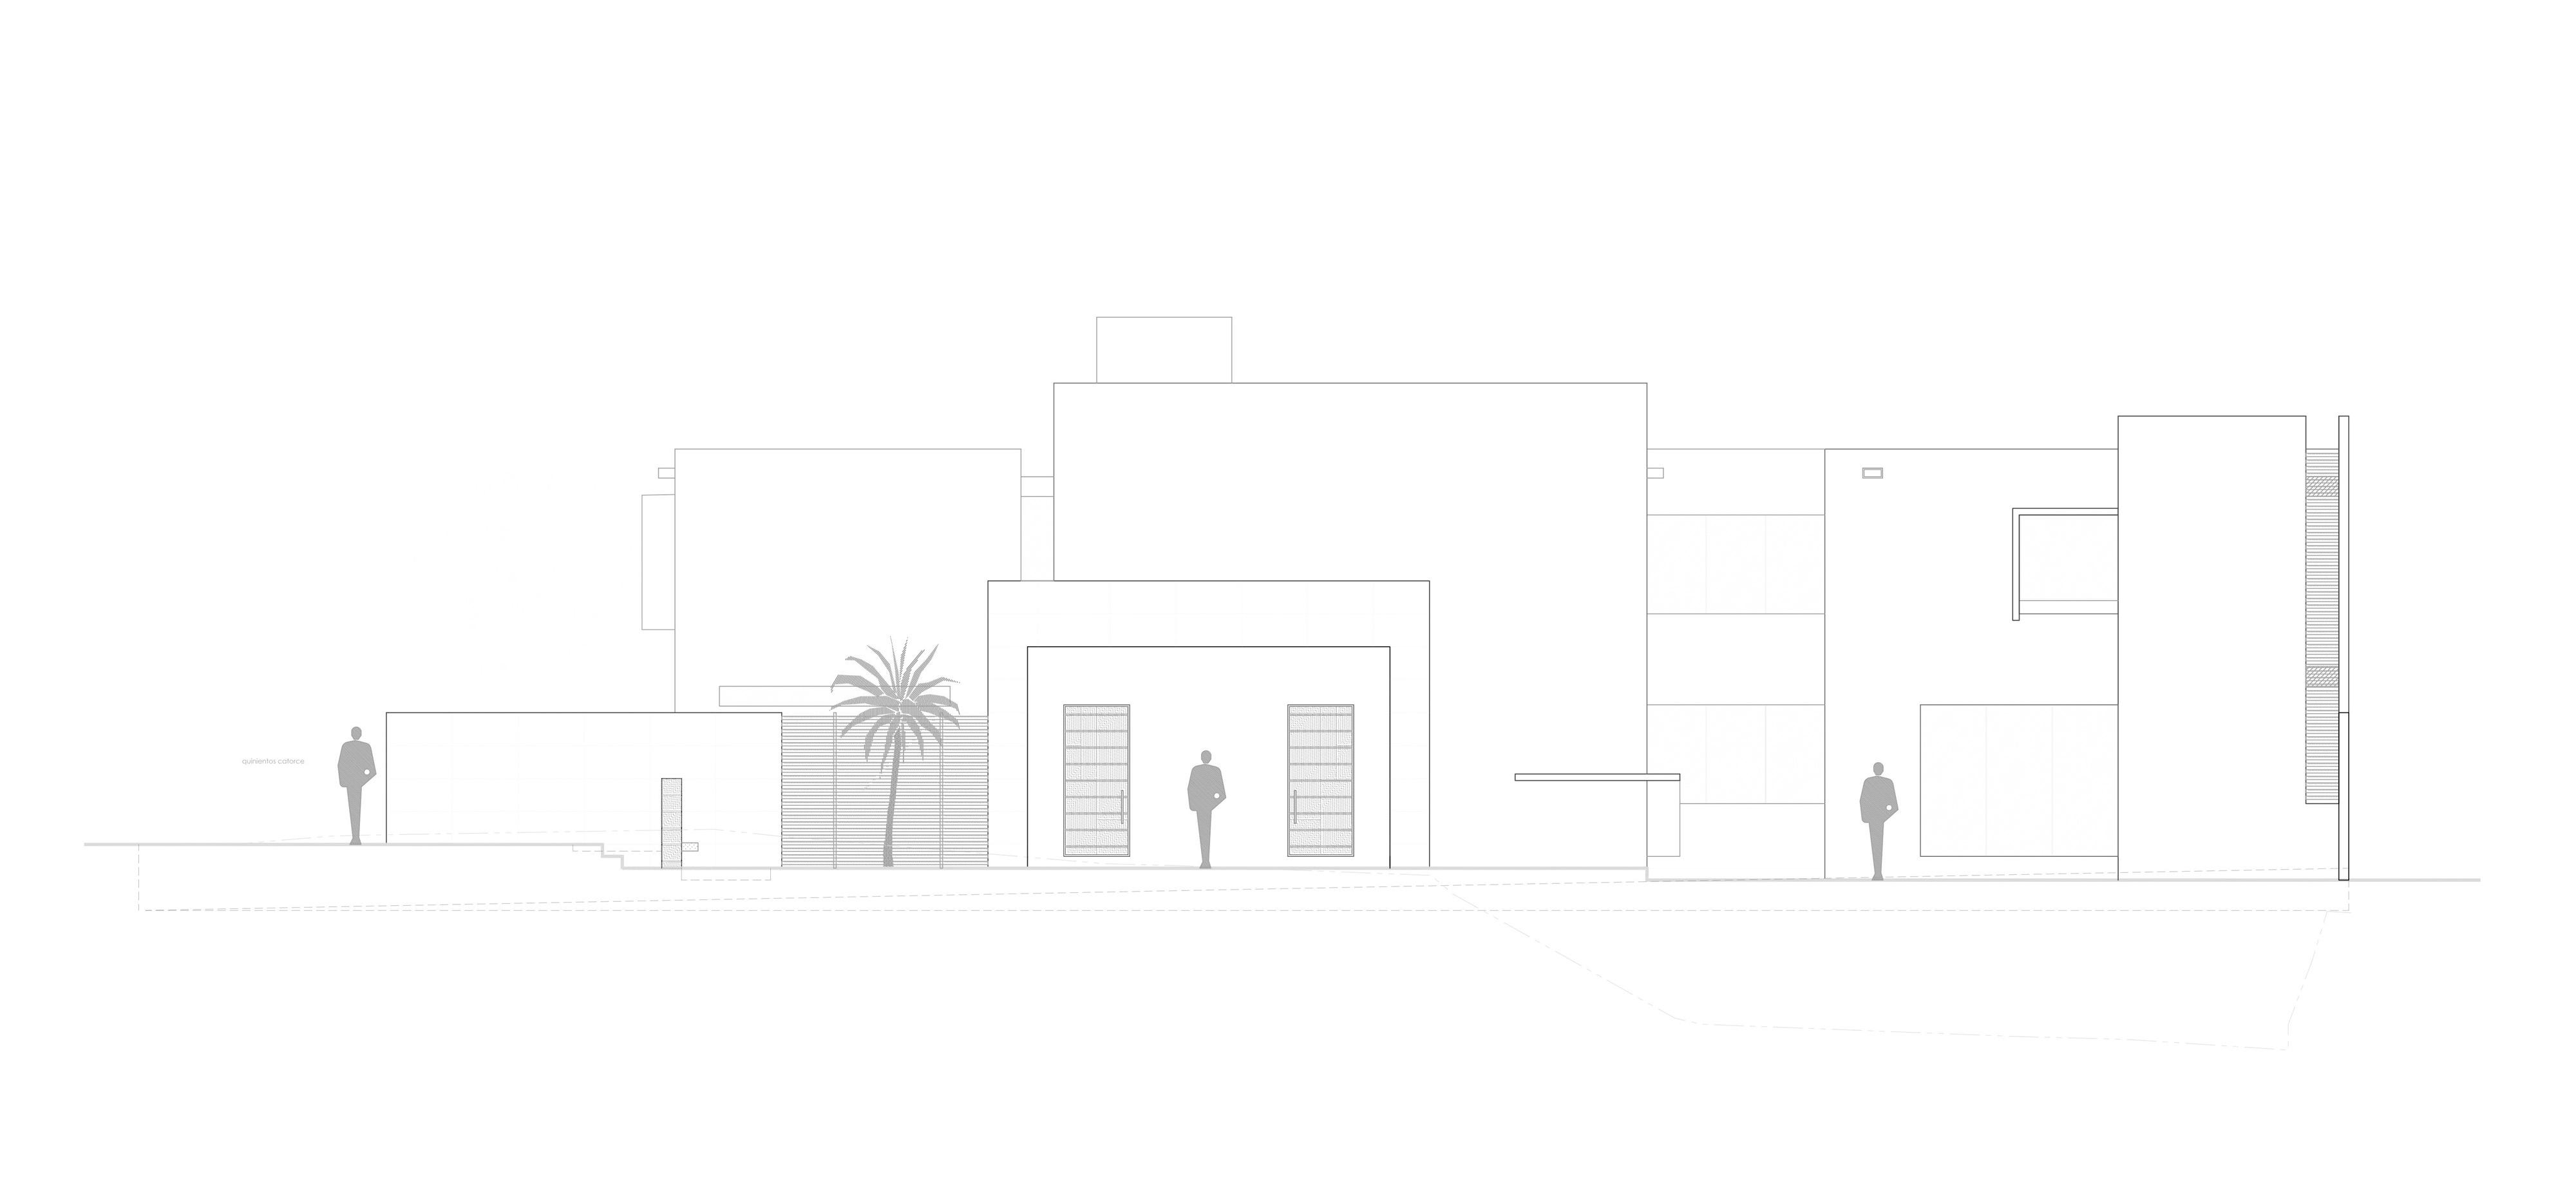 Casa 514 - s2a+designbureau, arquitectura, casas